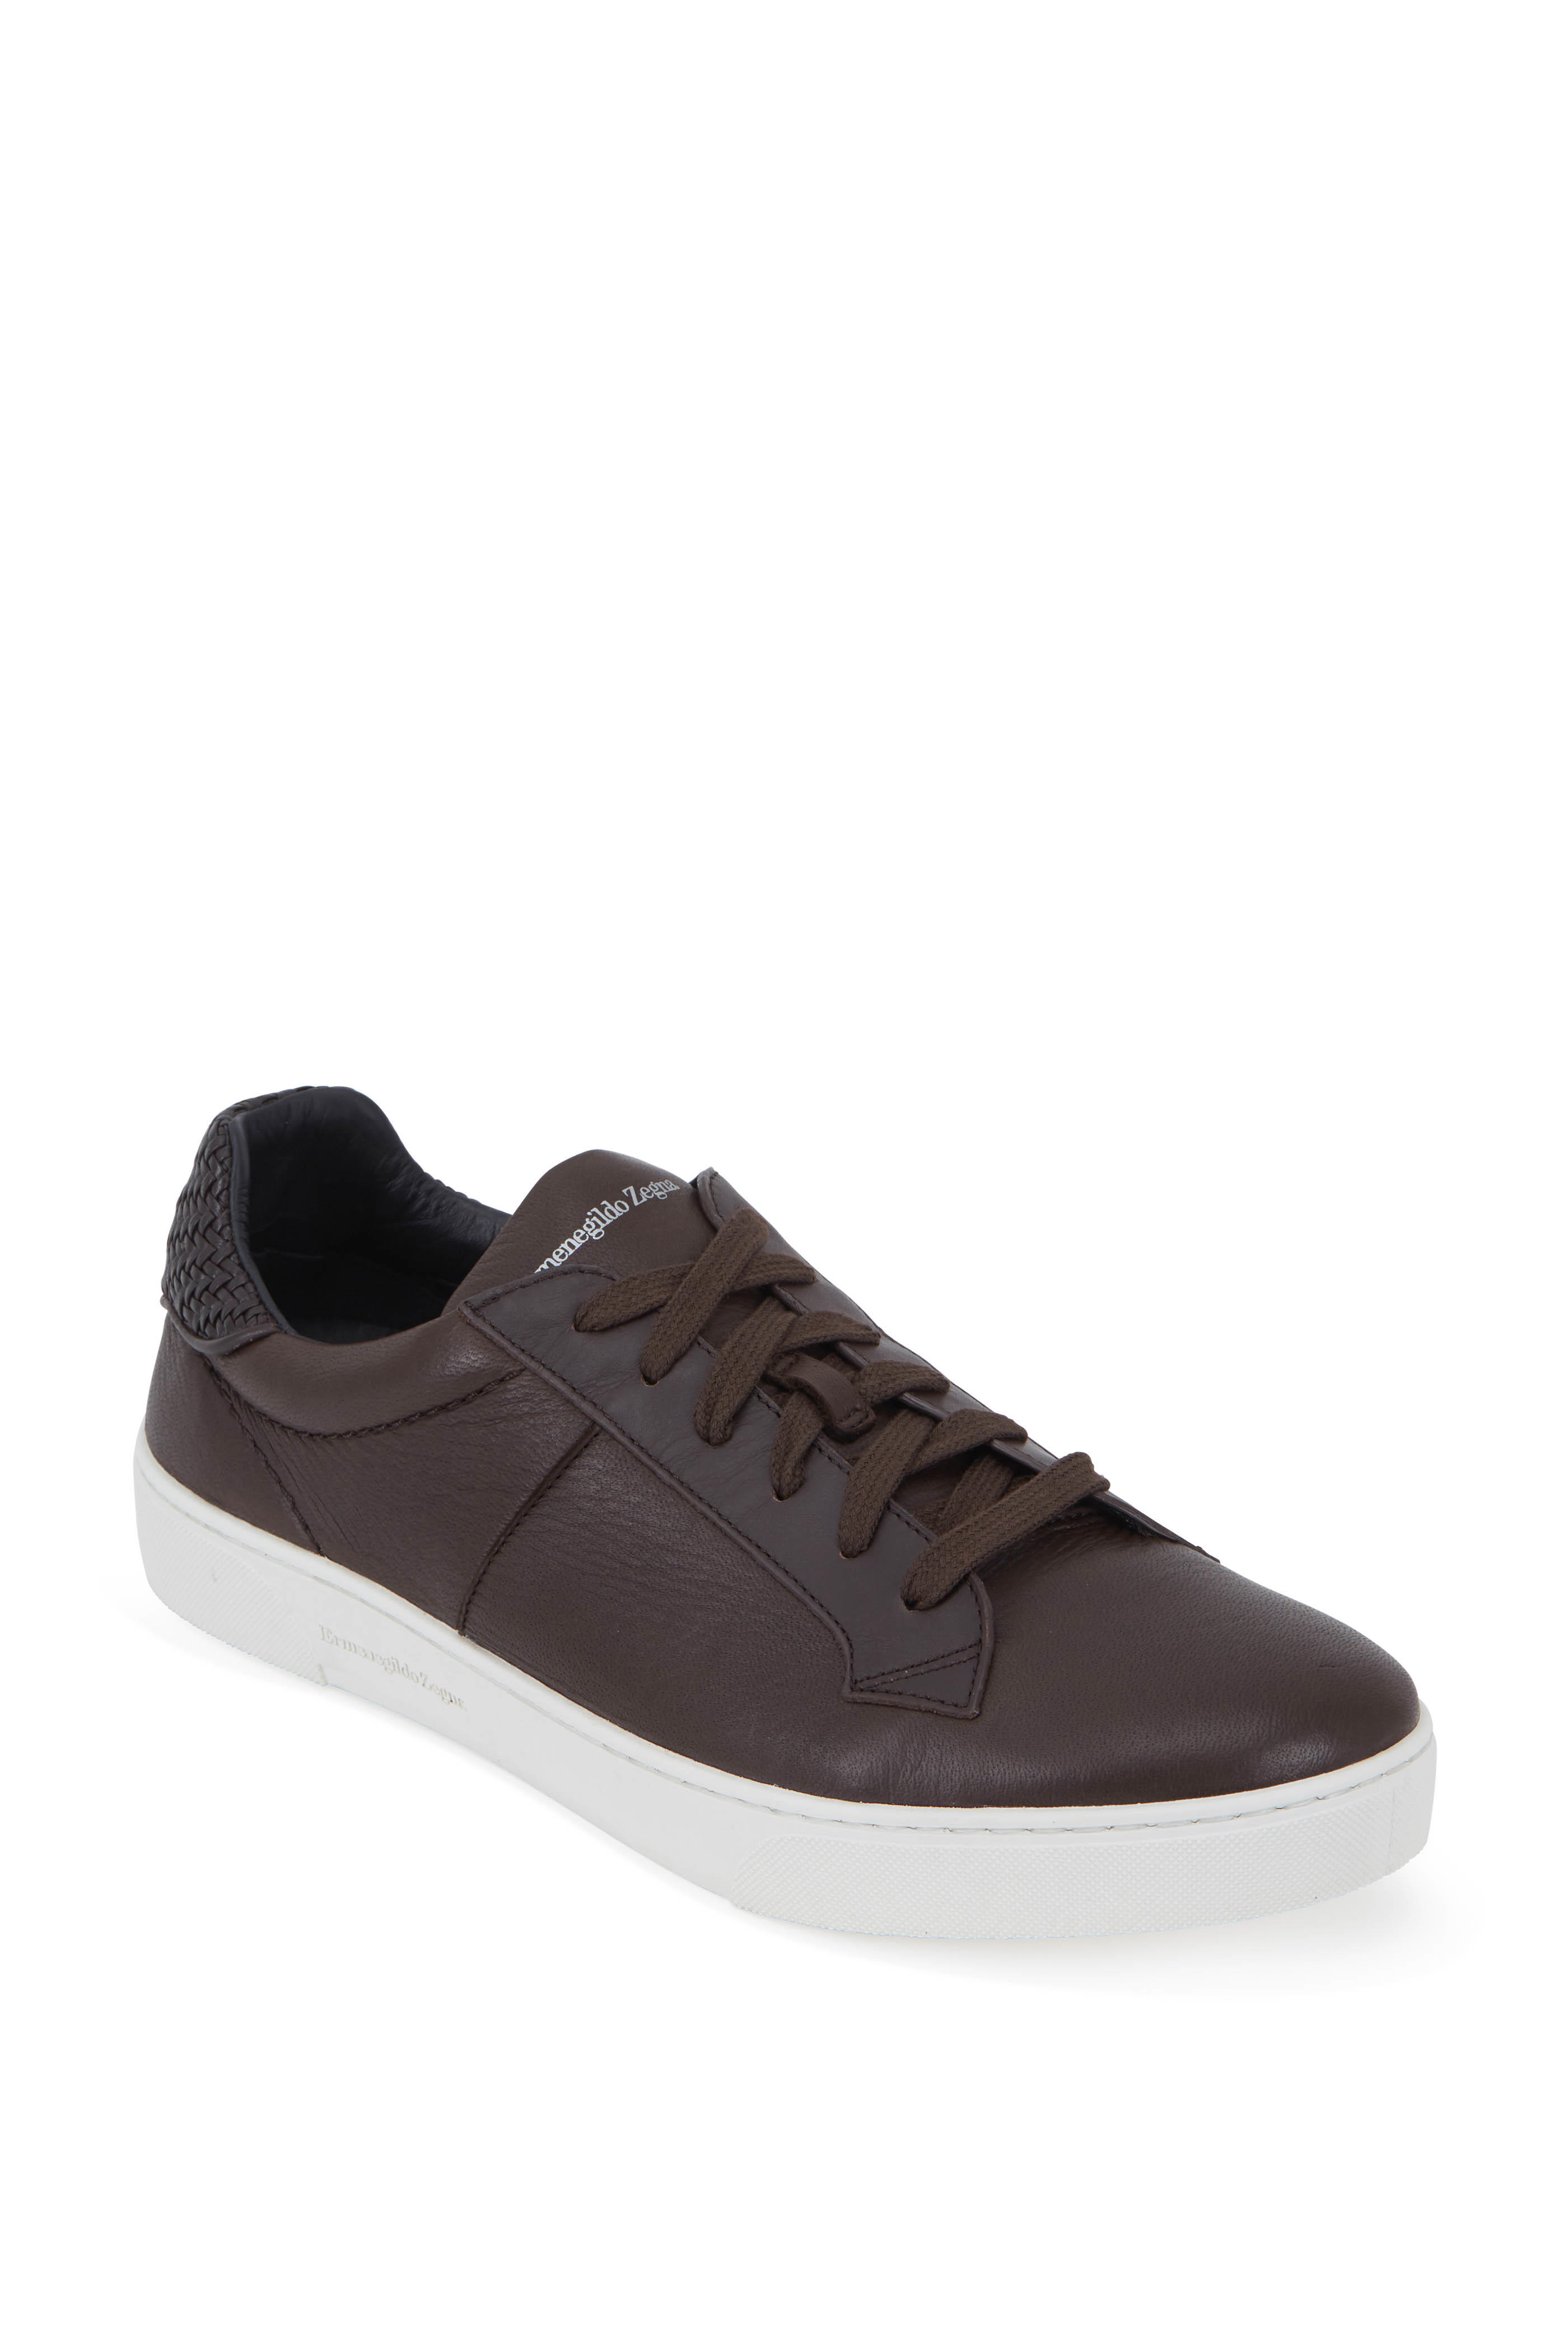 d98d22f2d8c140 Ermenegildo Zegna - Dark Brown Leather Low-Top Sneaker